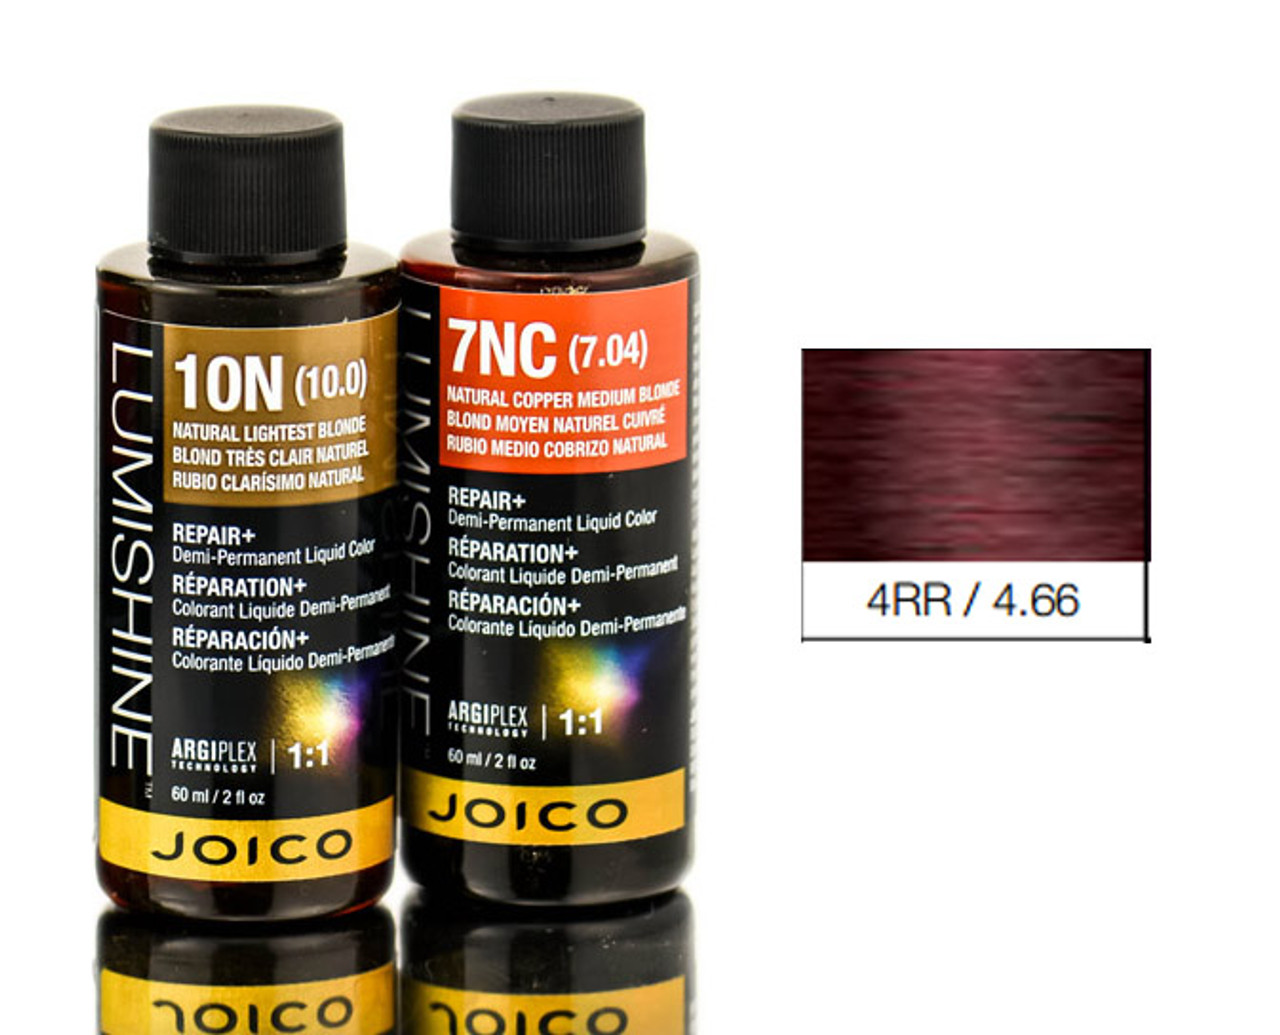 Joico Lumishine Demi Permanent Liquid Color Sleekshop